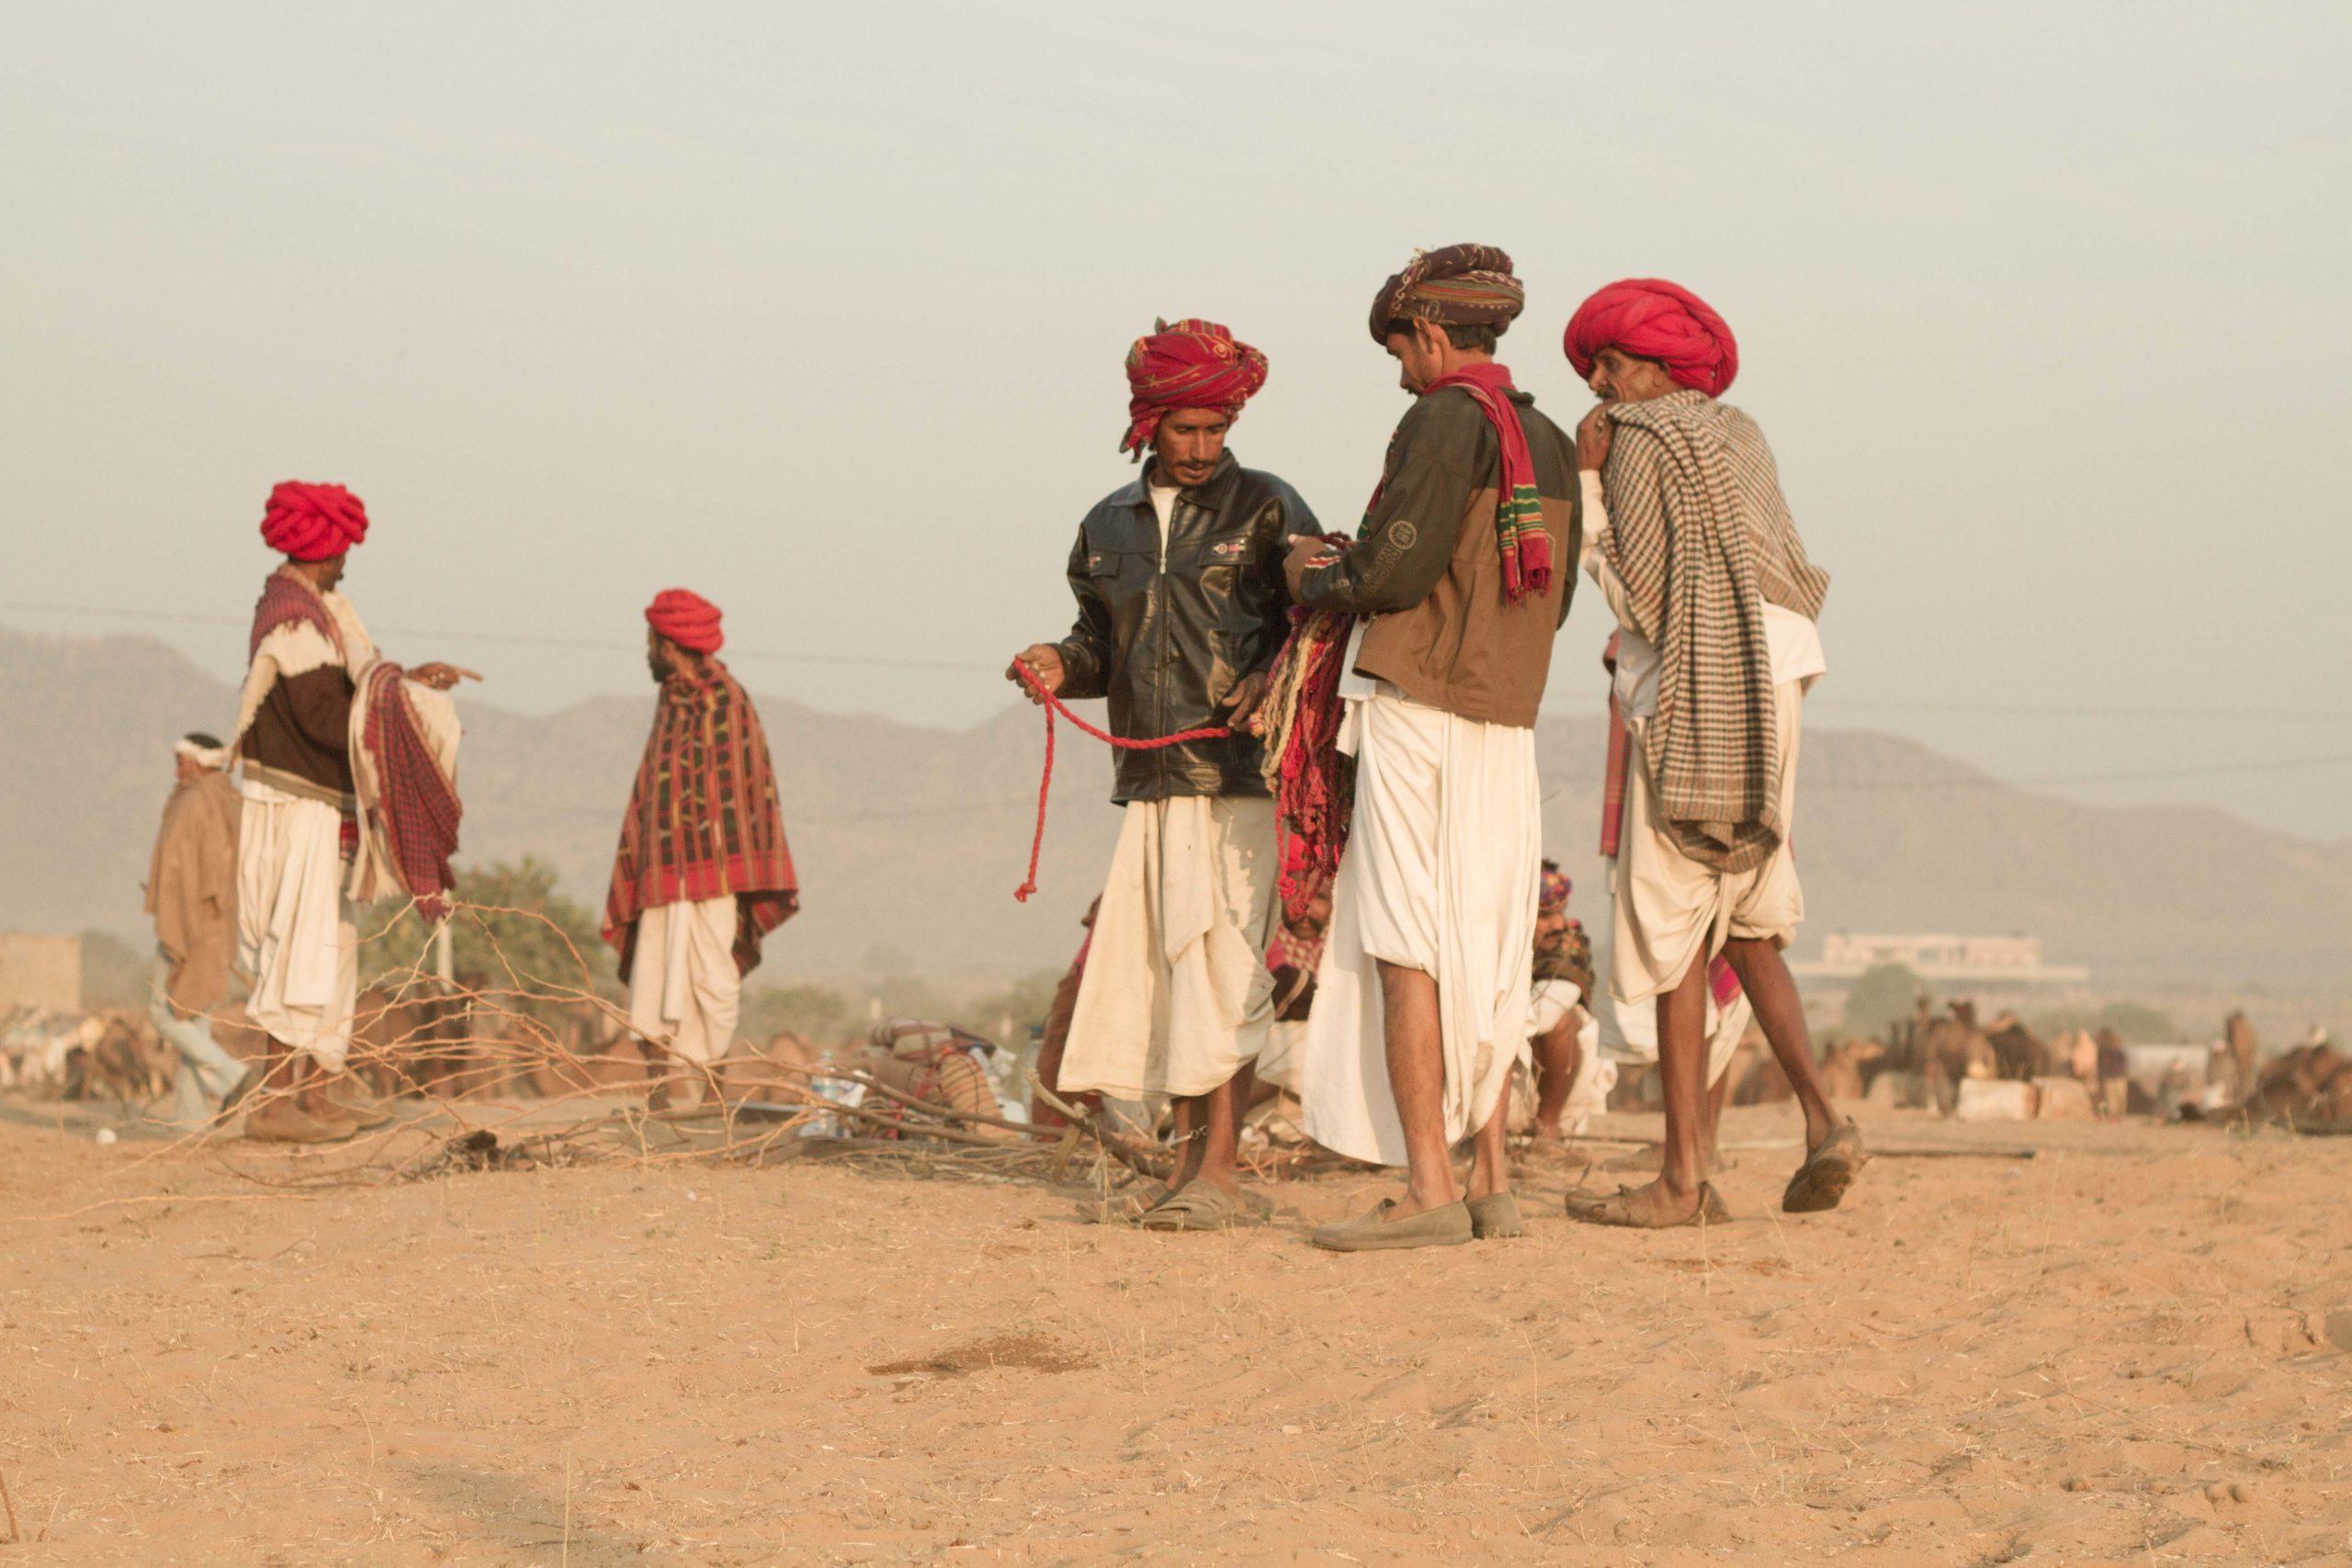 Travel photography, Camel Fair Festival, Rajasthan